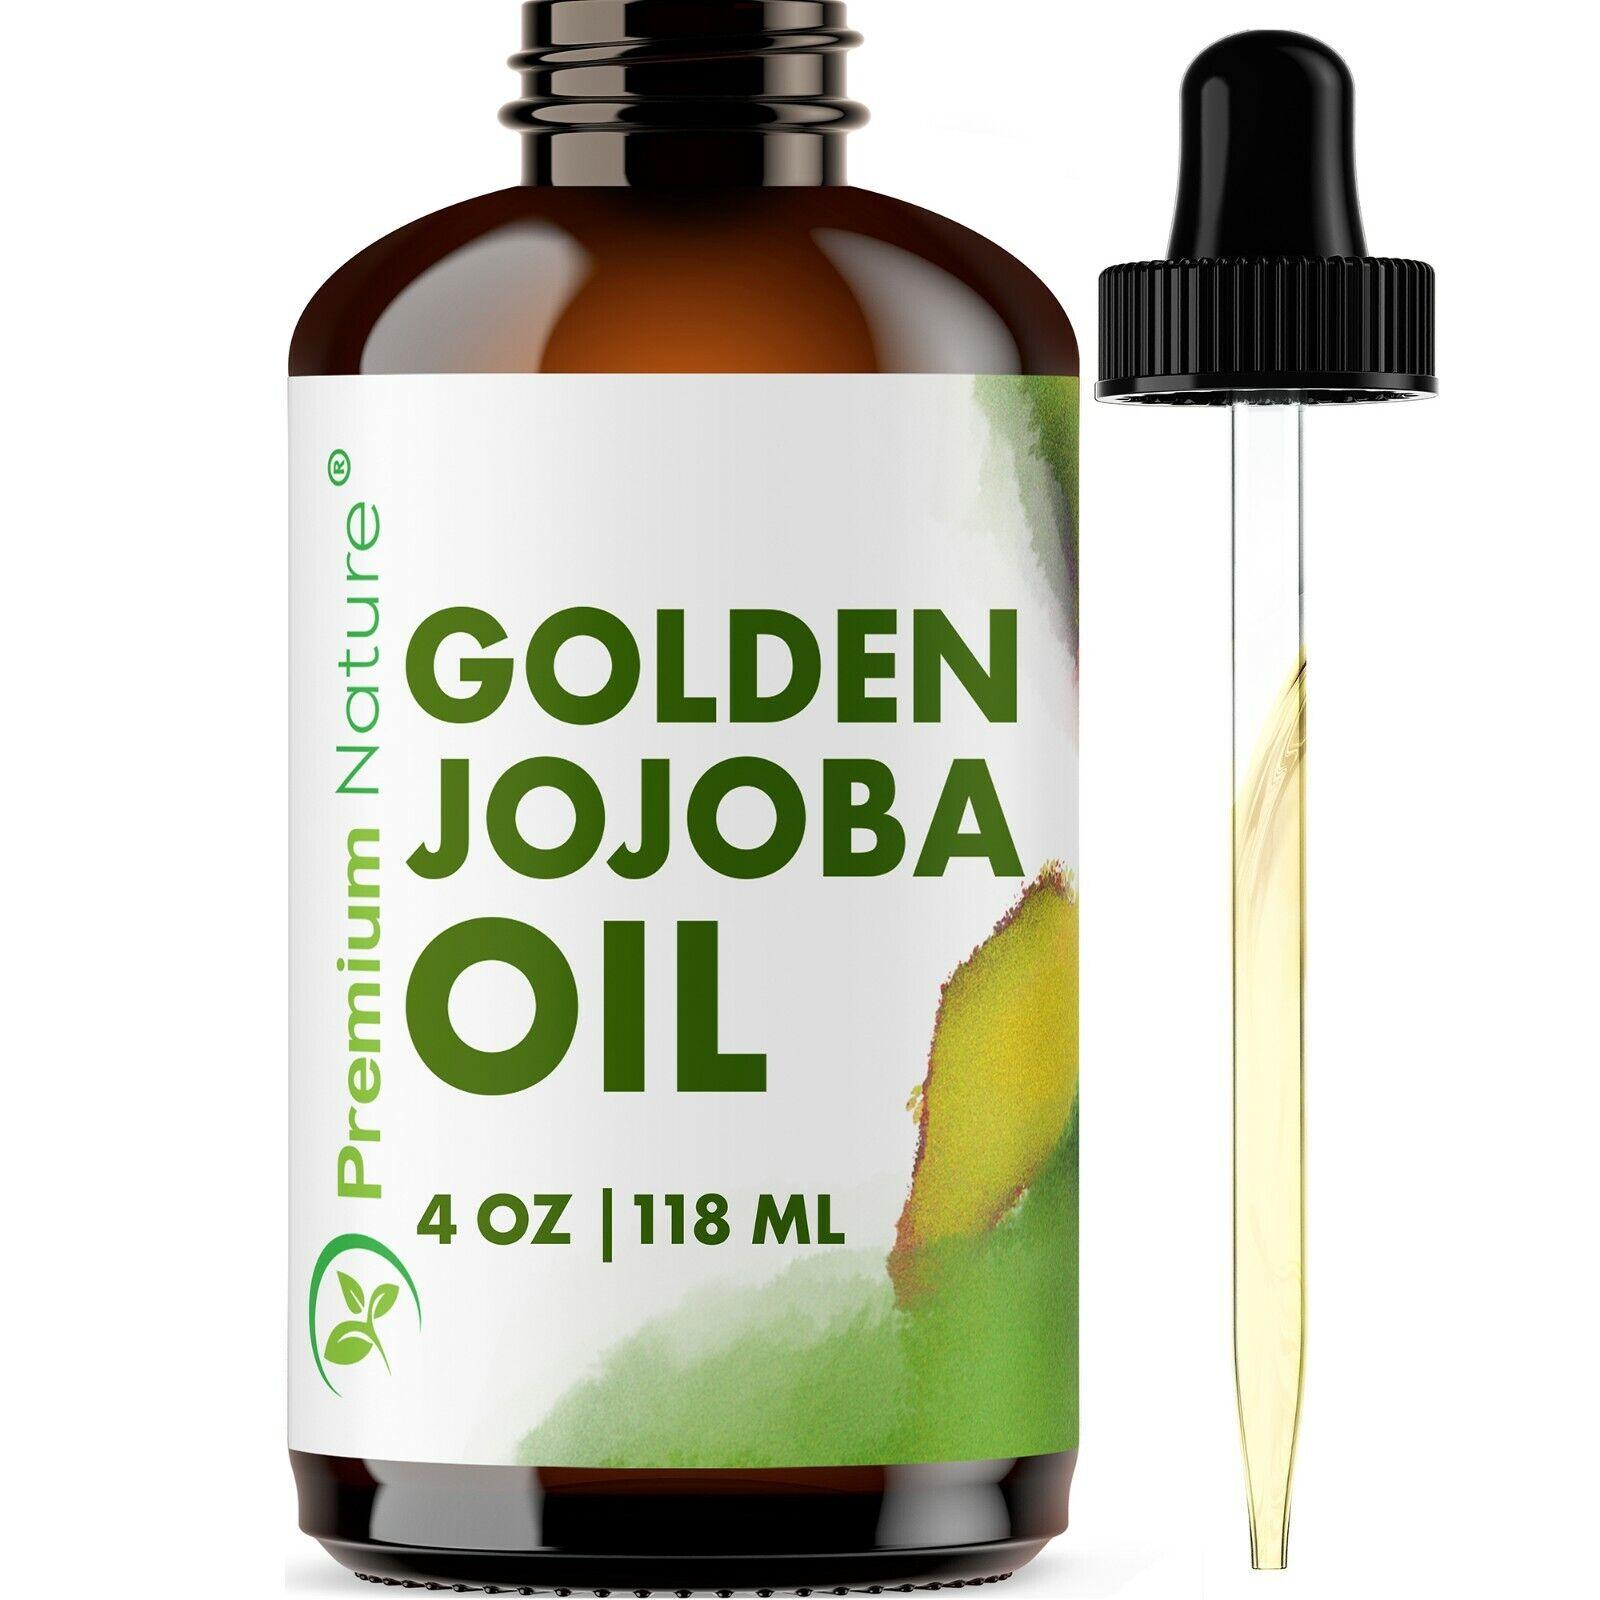 Golden Jojoba Oil Facial Moisturizer Cleaner Nail Hair Growt